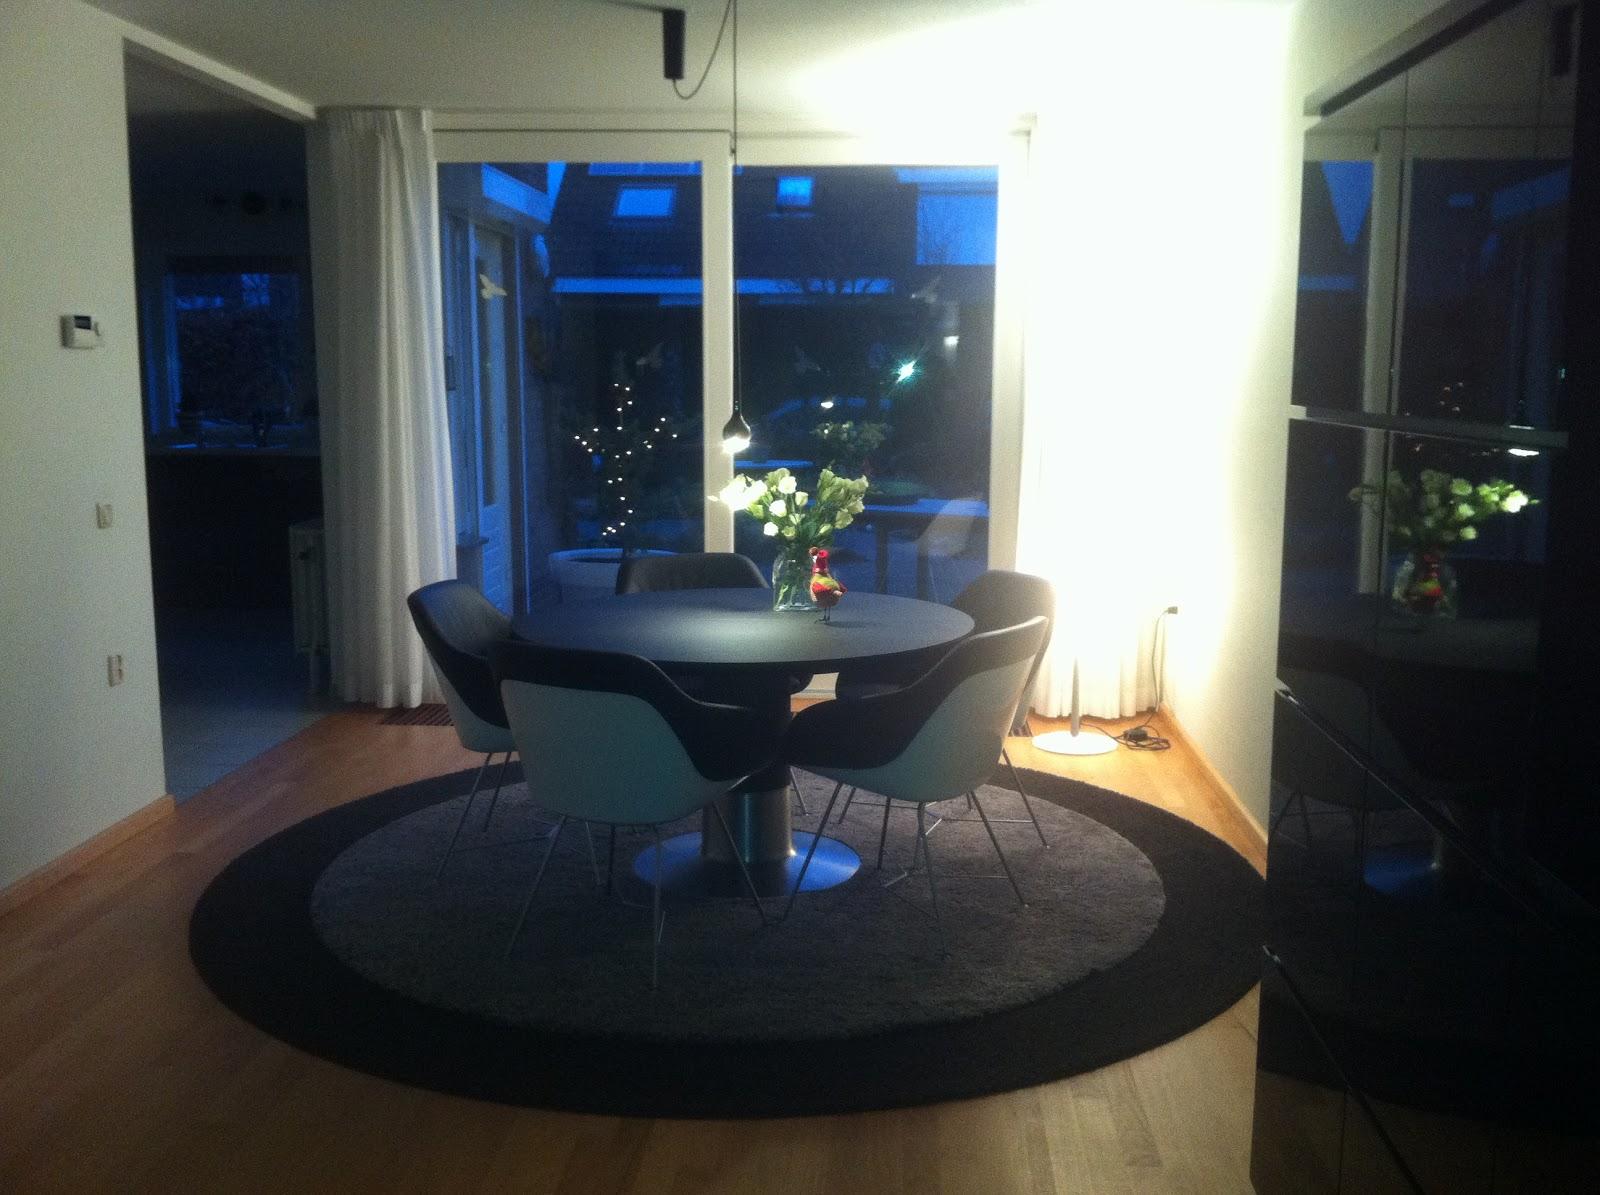 Walter knoll turtle stoelen en arco balance tafel ploemen interieur